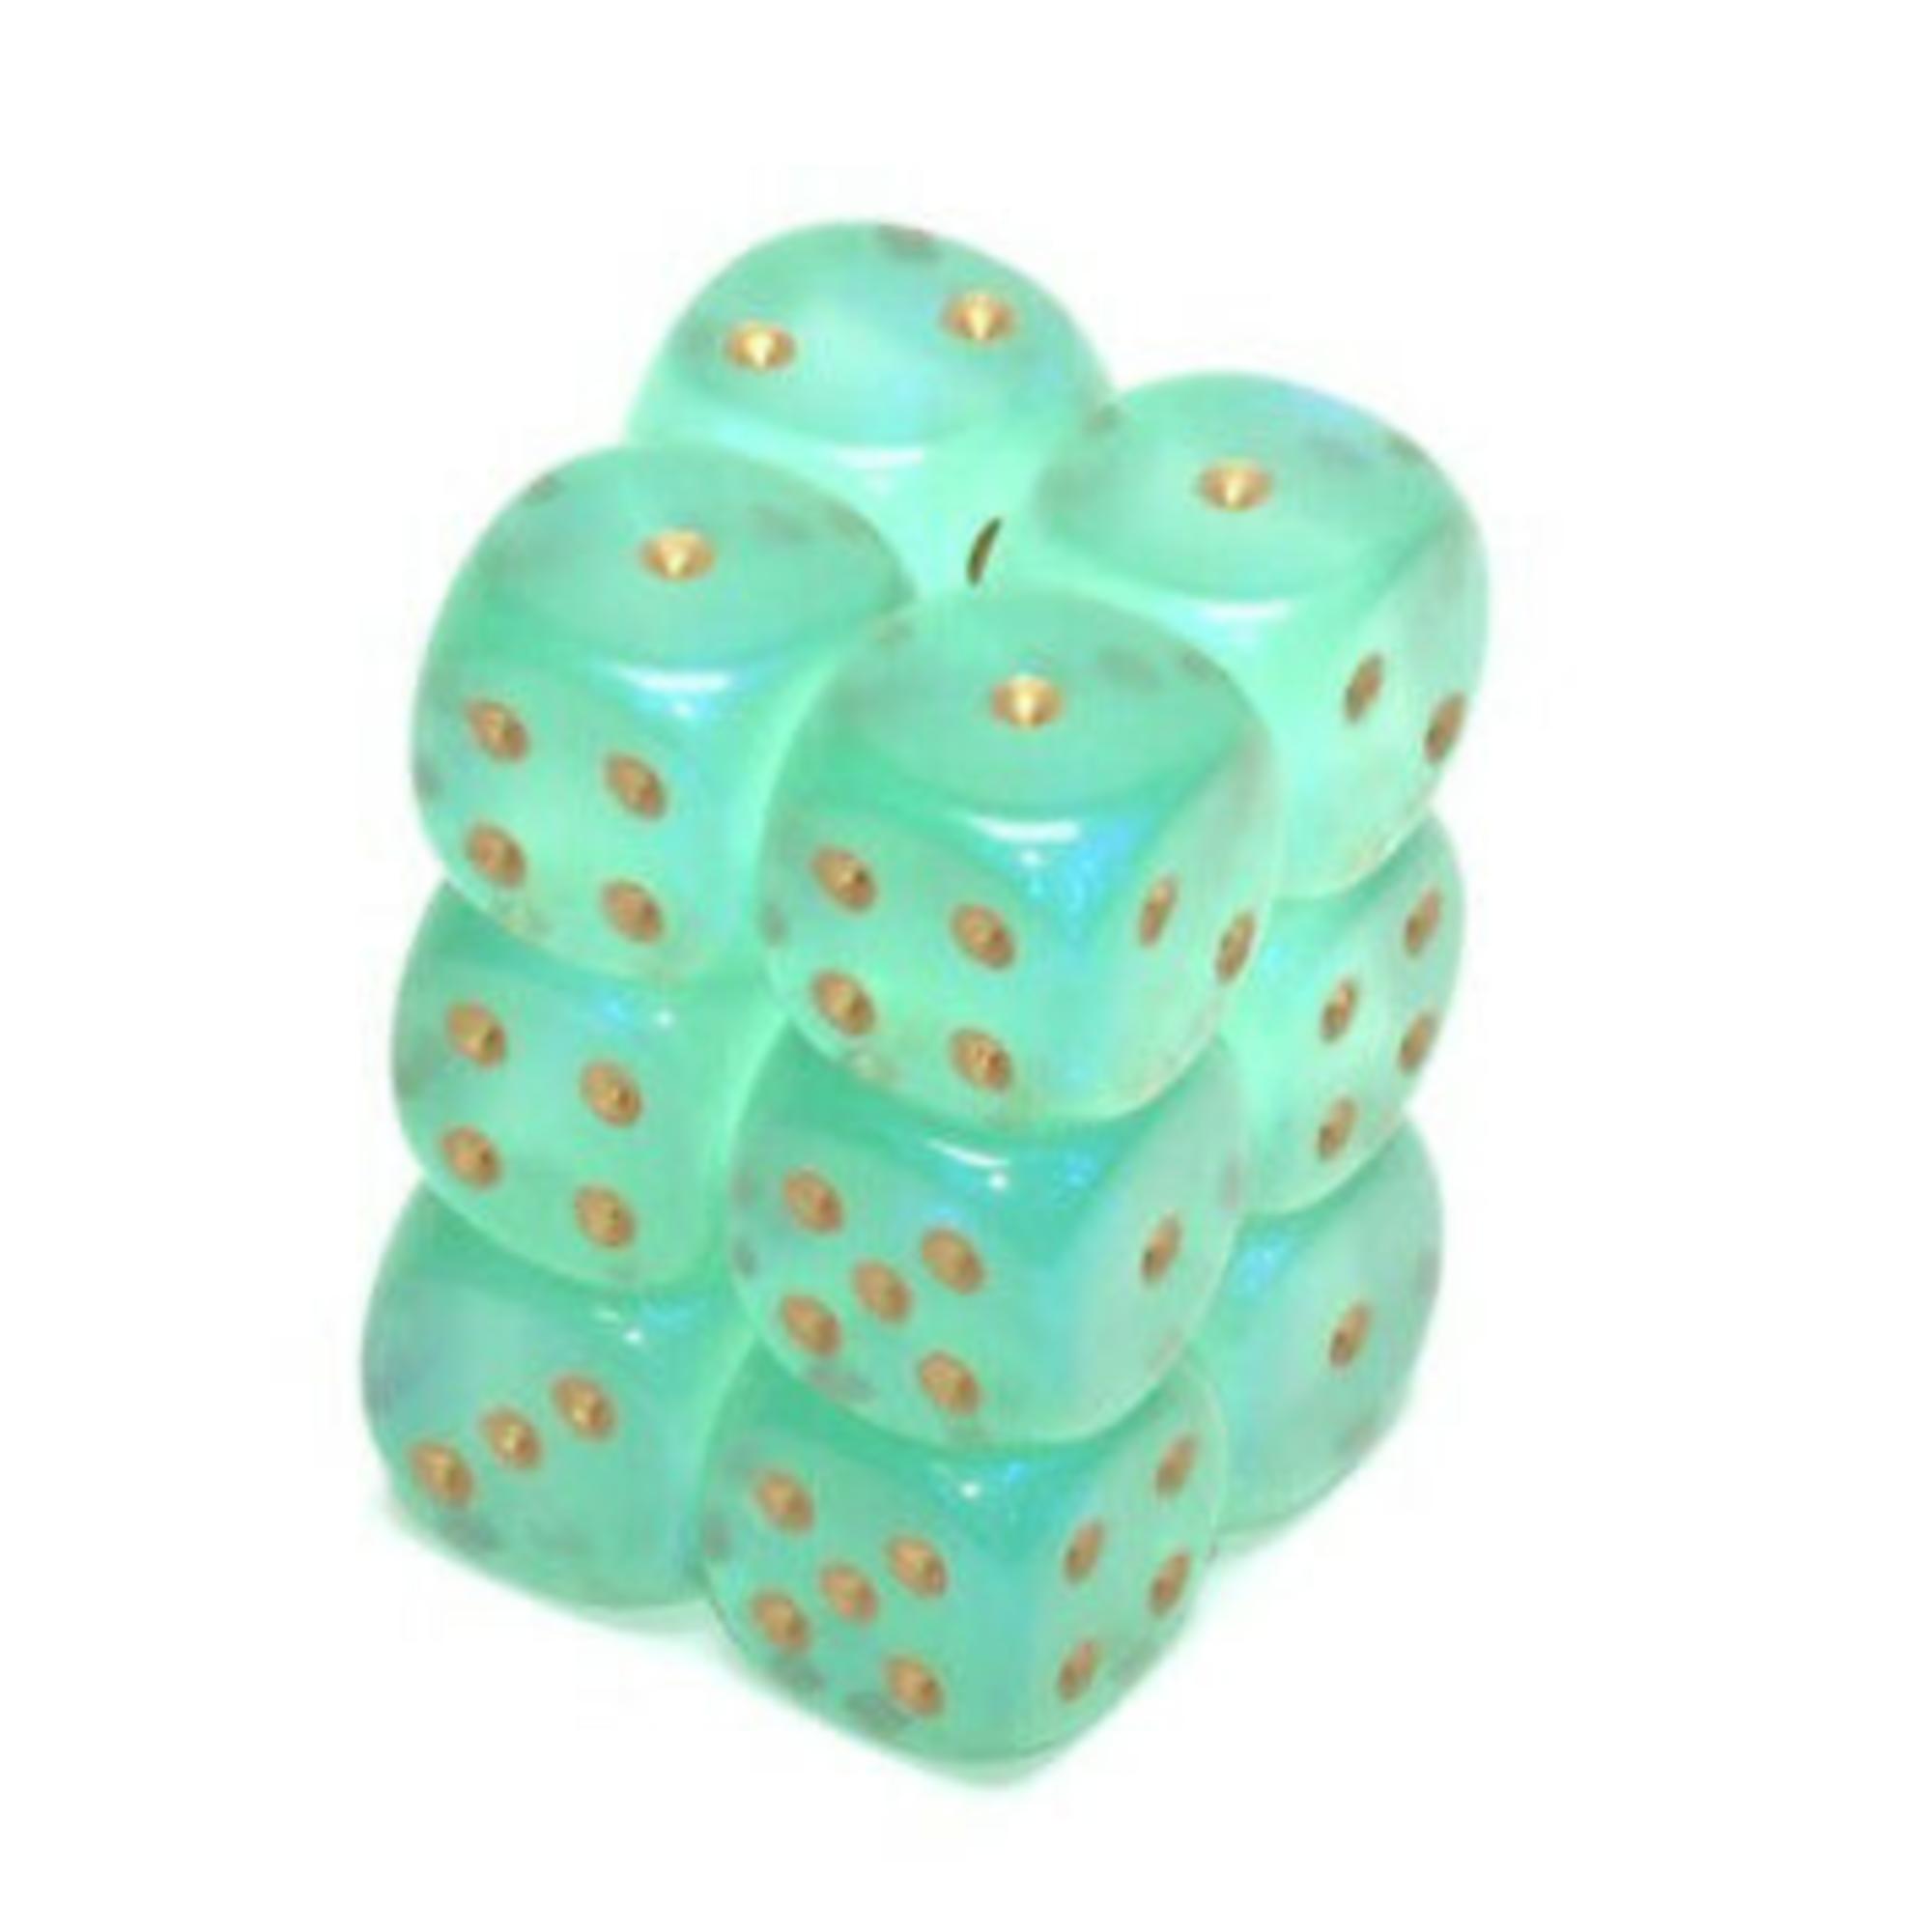 Chessex Borealis: 12D6 Light Green/Gold